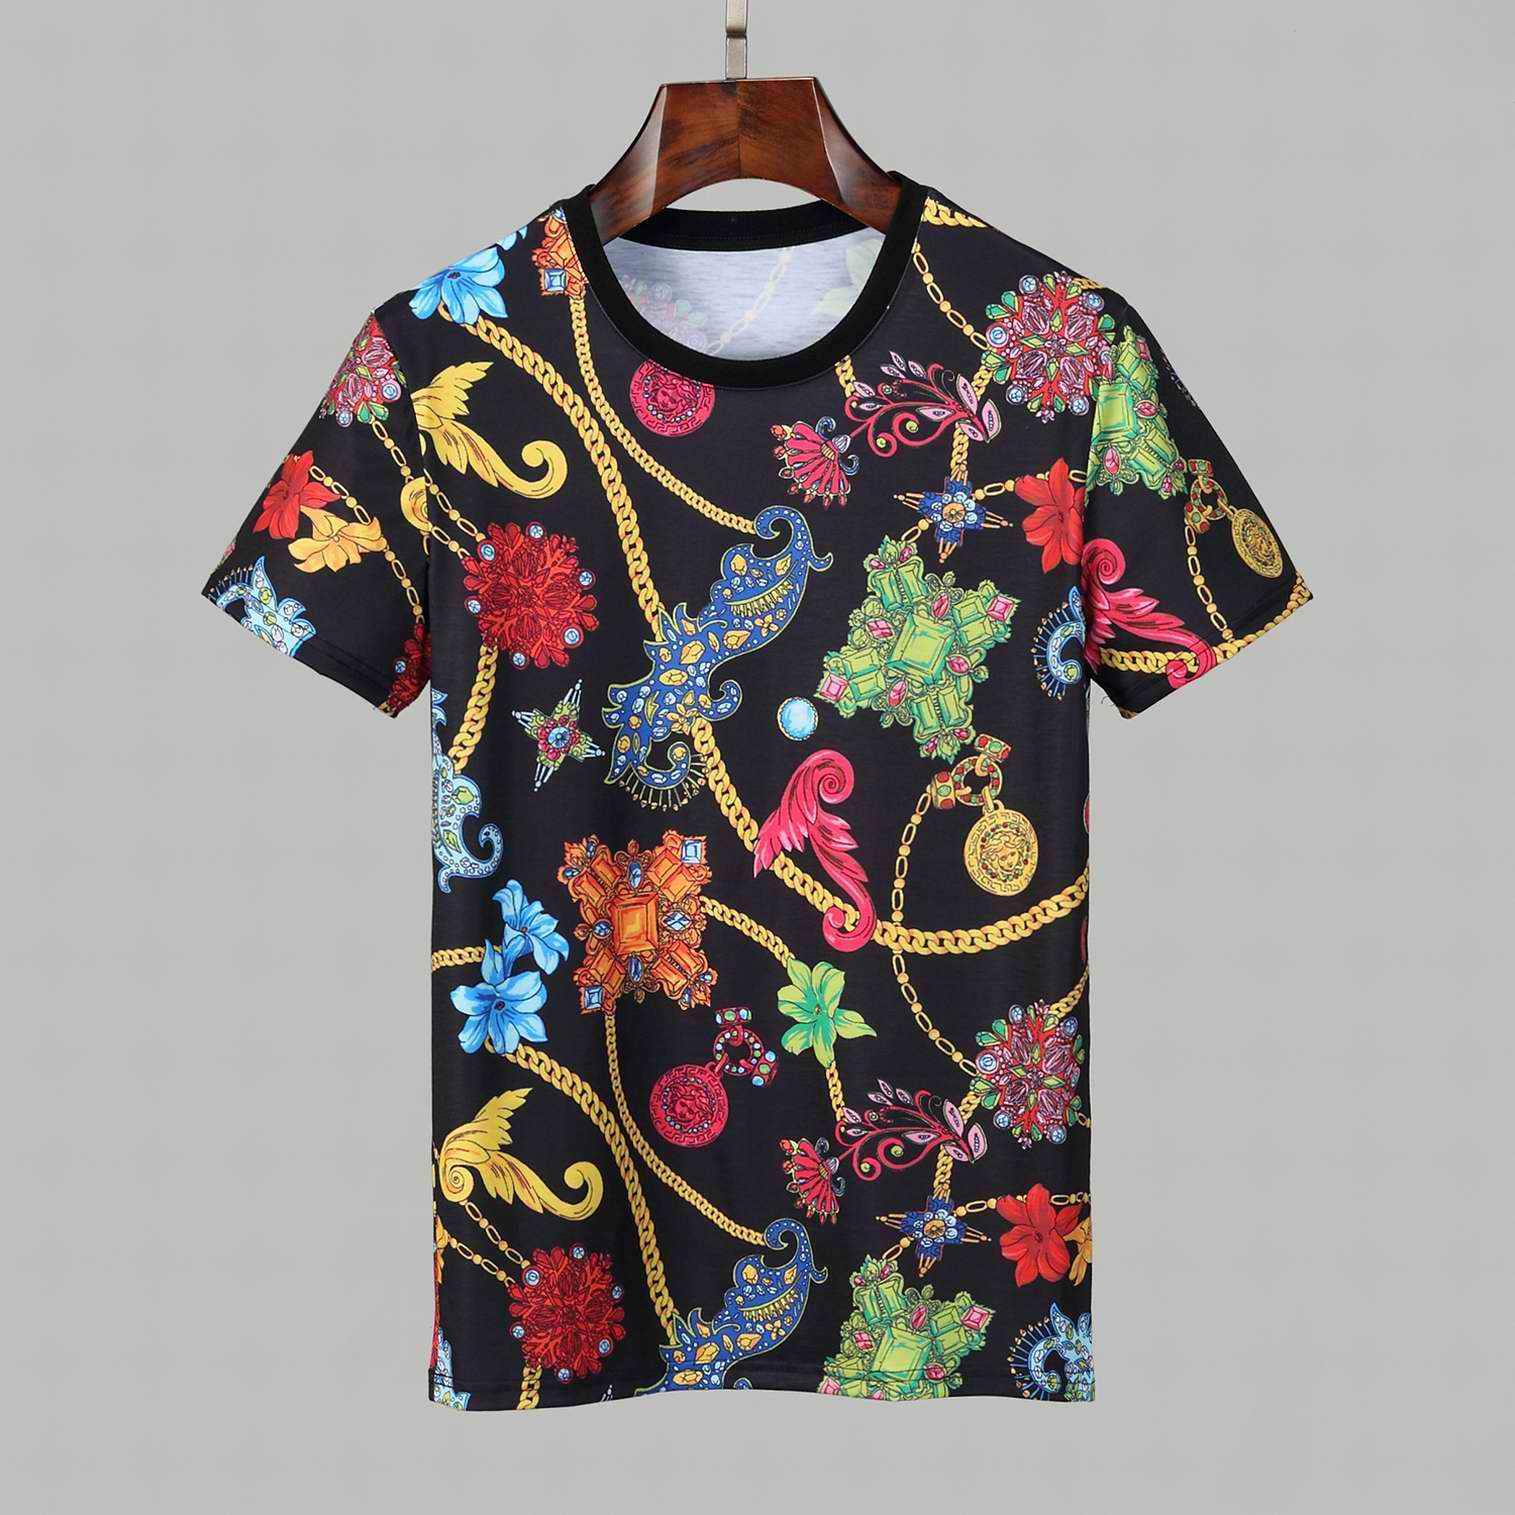 Versace Shirts 022